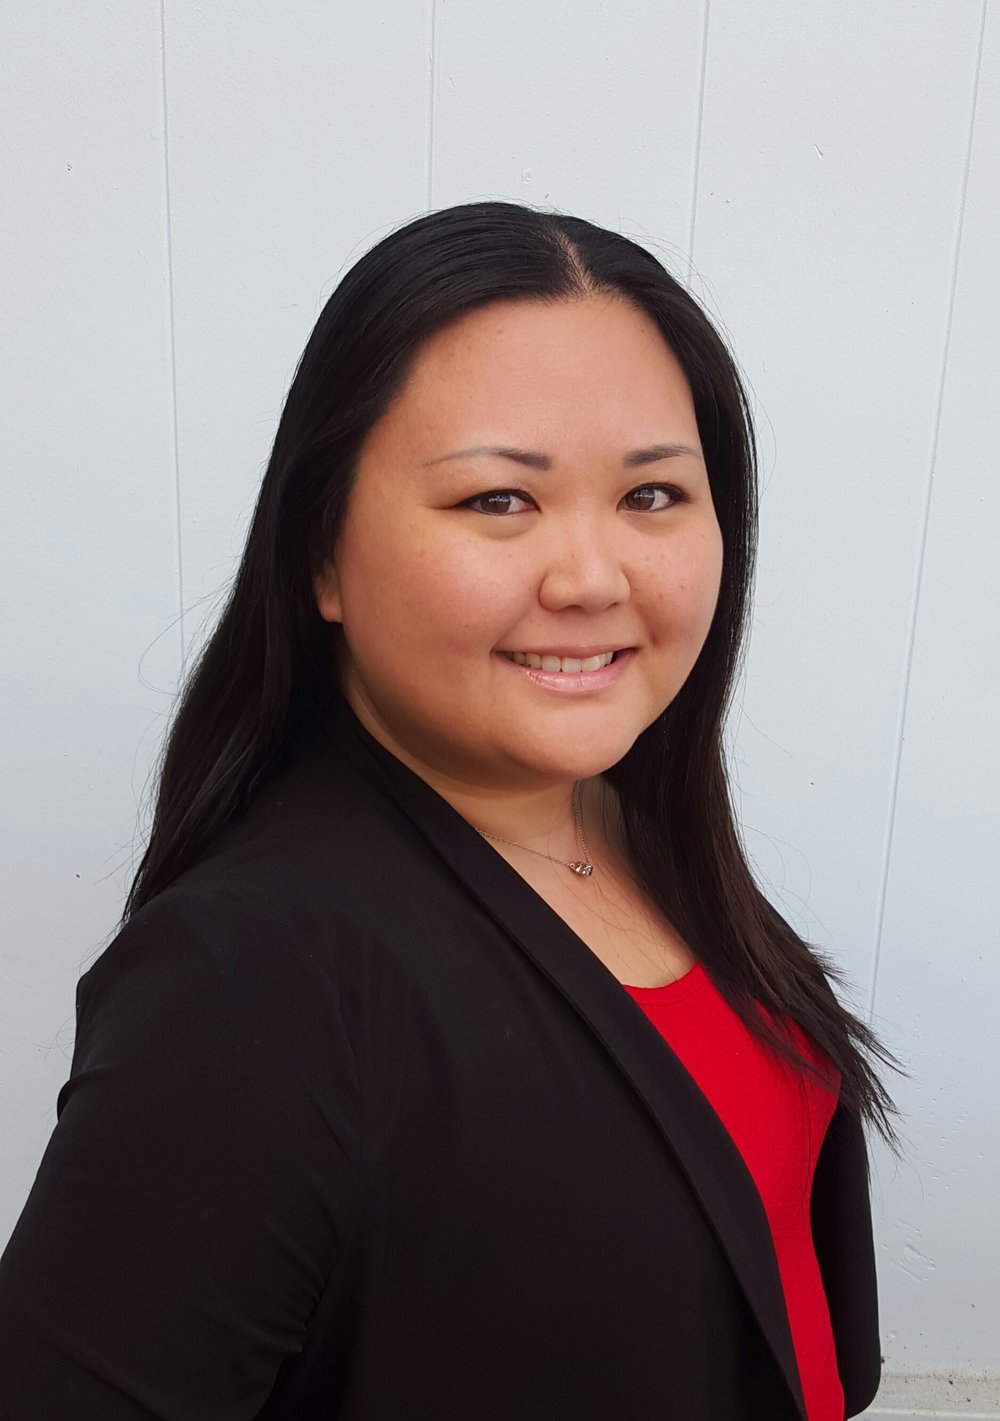 Courtney Takabayashi